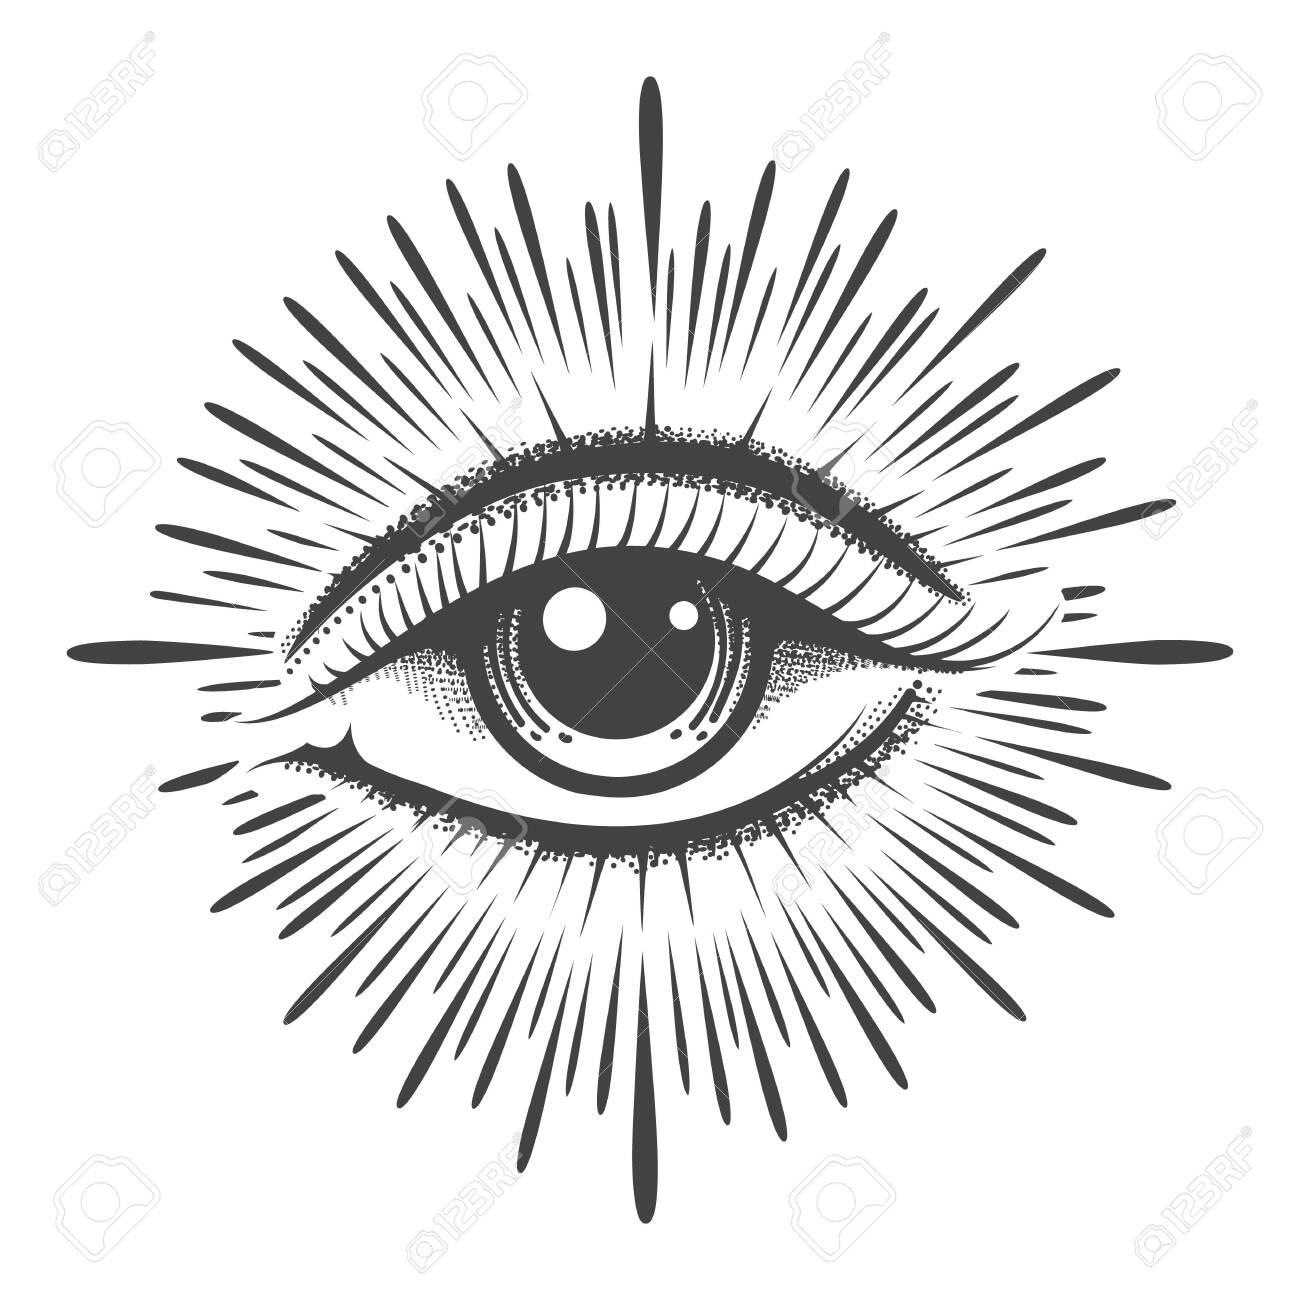 All seeing eye masonic symbol tattoo. Vision of Providence emblem. Vector illustration. - 144493032